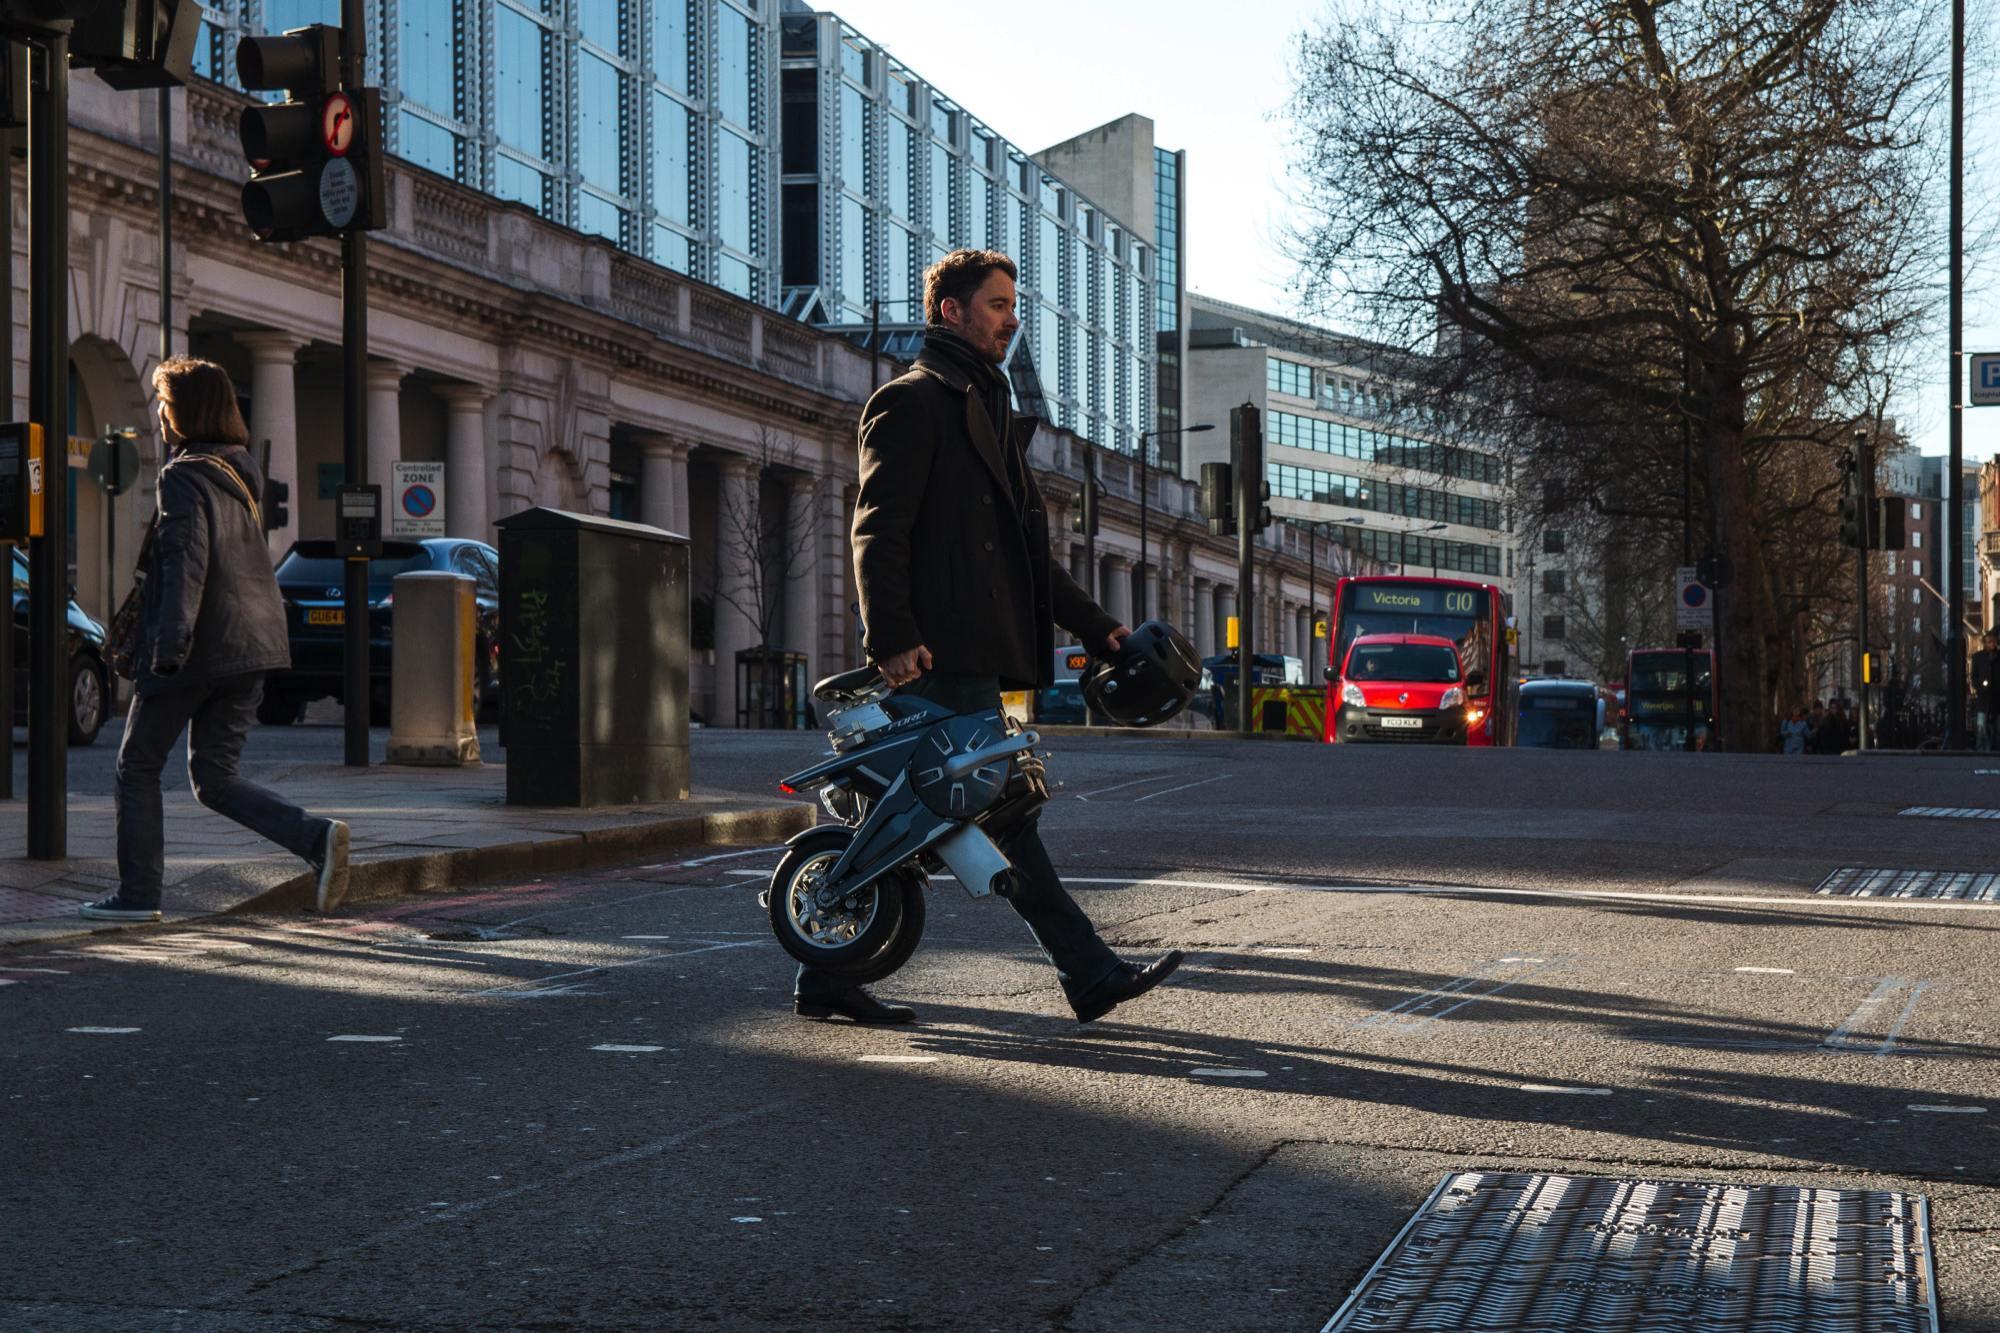 Ford Mode:Me y Mode:Pro, bicicletas eléctricas